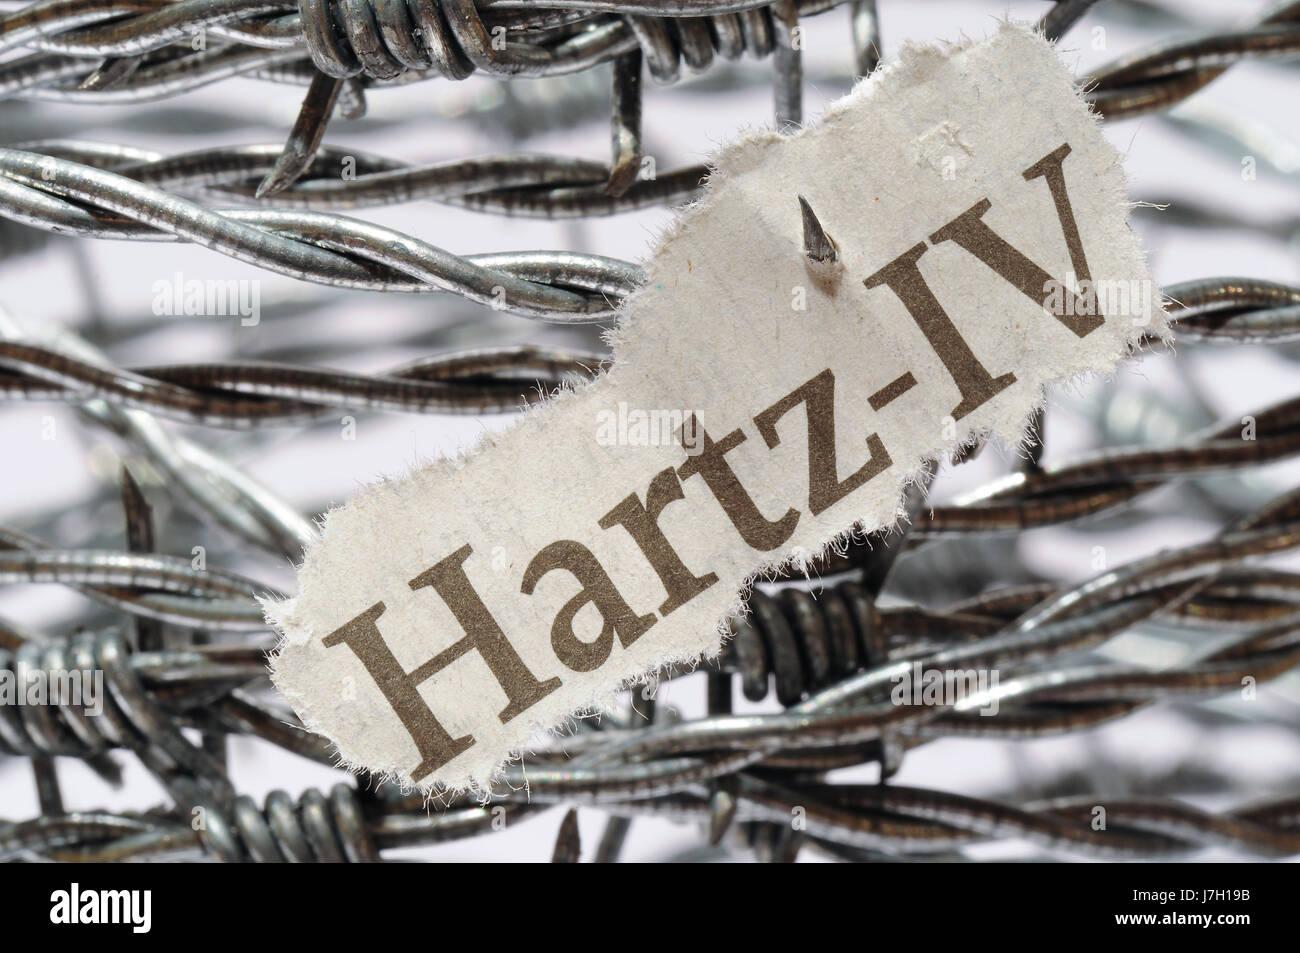 hartz iv - Stock Image